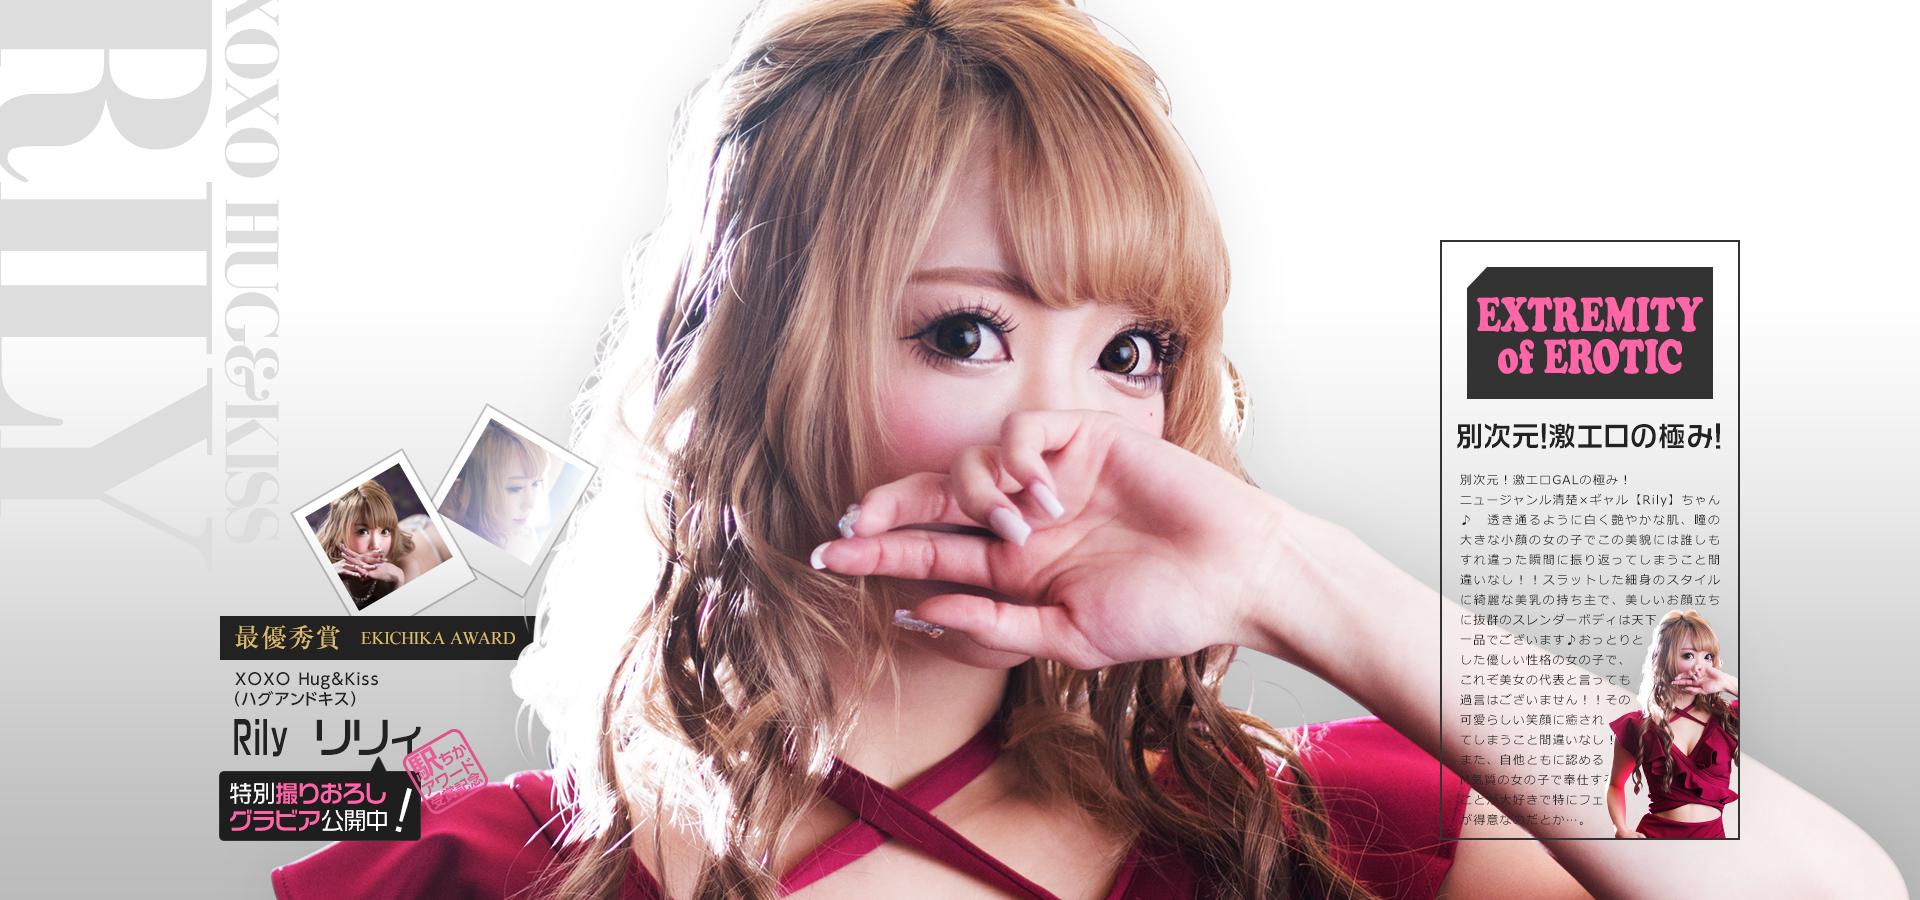 XOXO Hug&Kiss (ハグアンドキス) | Rily リリィ